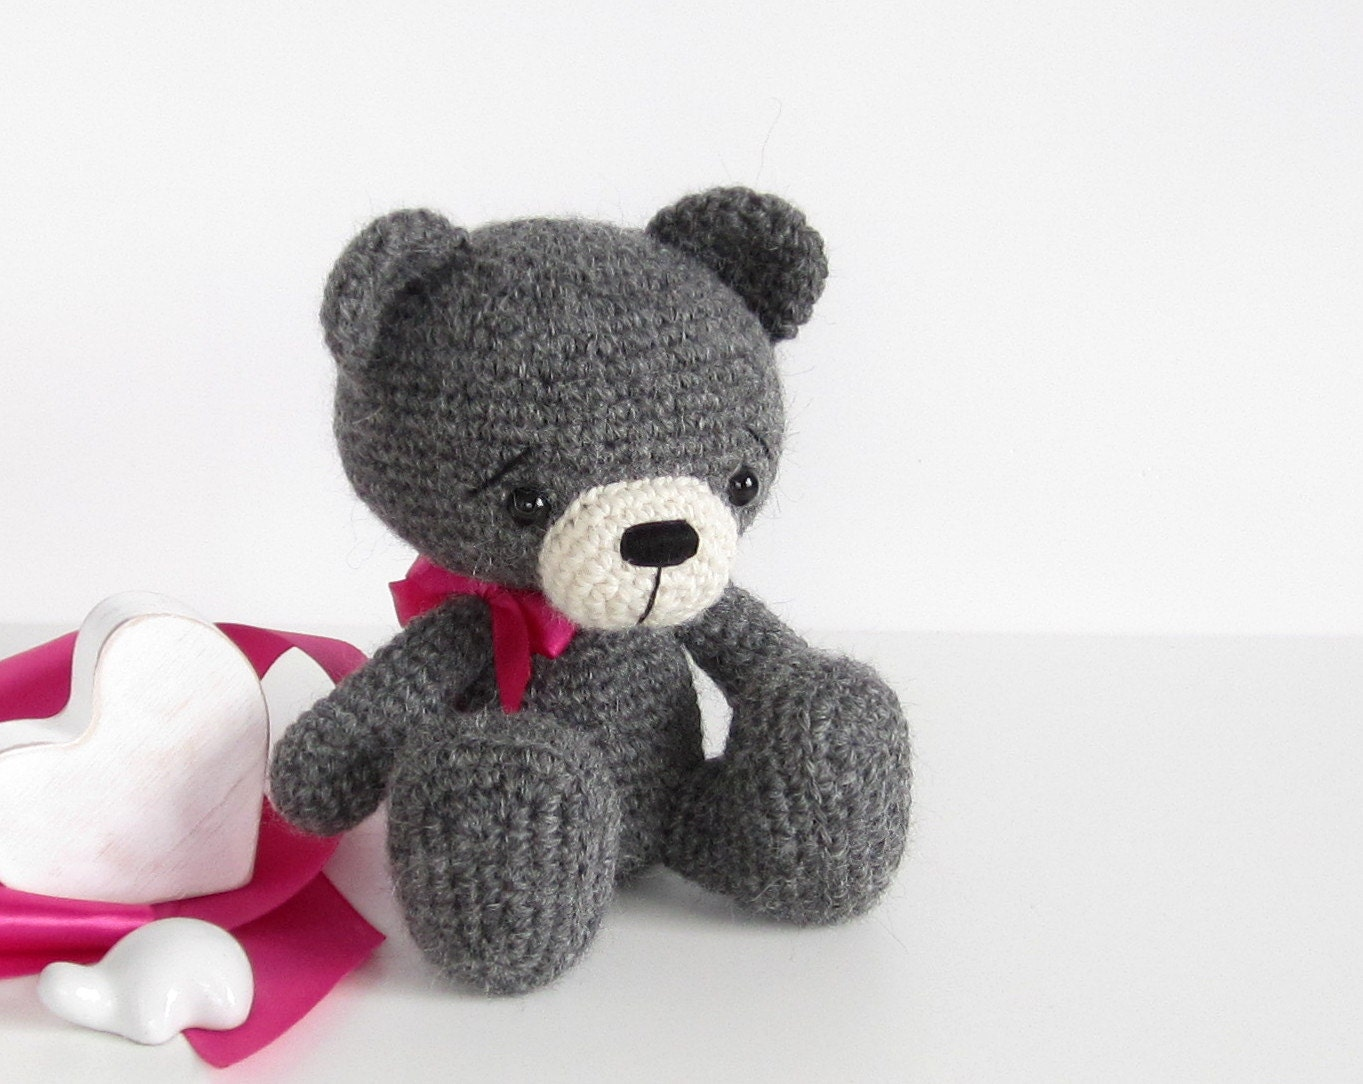 Amigurumi Care Instructions : Sitting teddy bear Amigurumi animal Hand crocheted soft